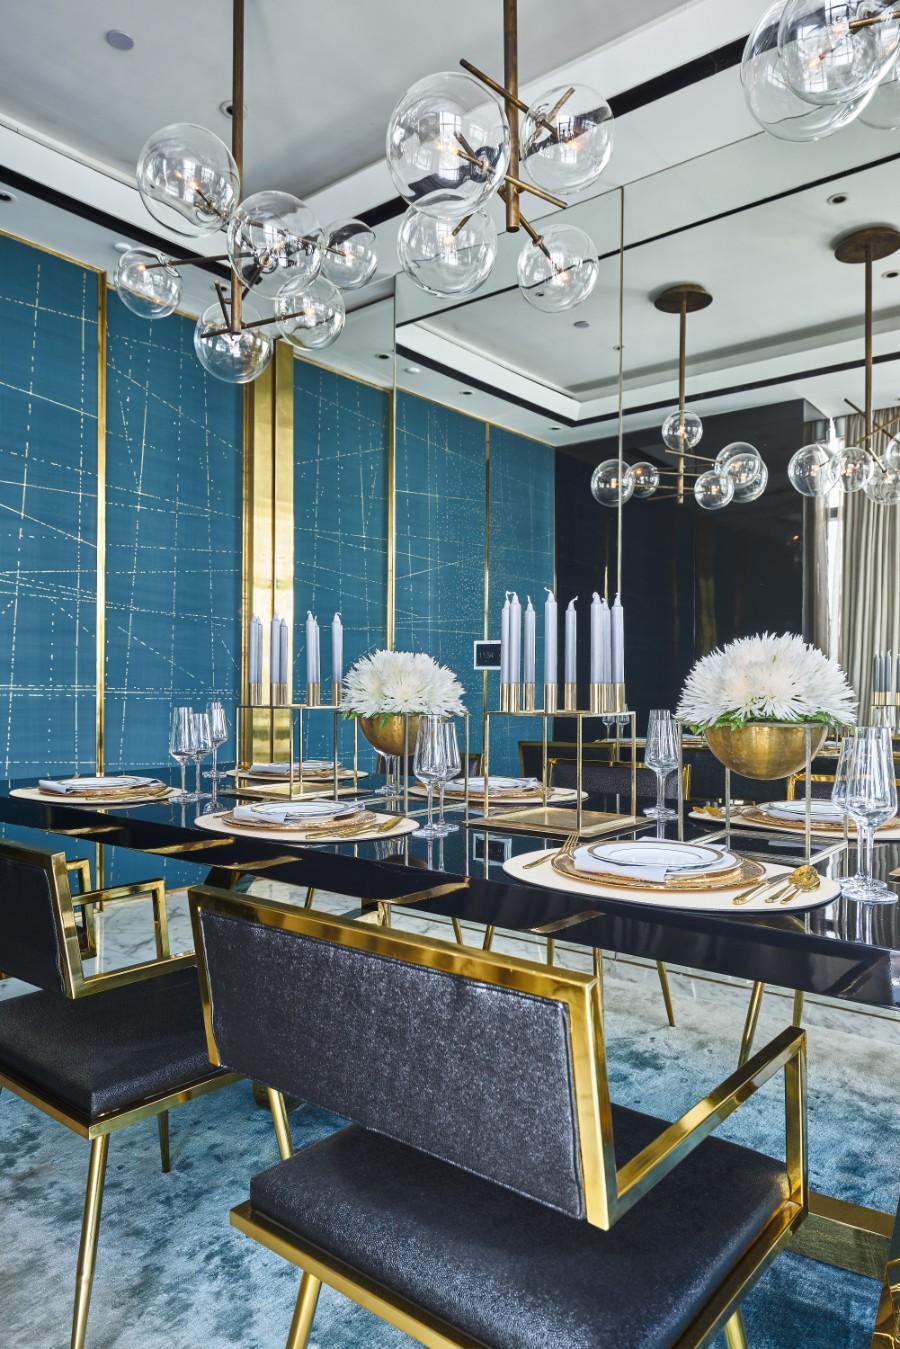 exclusive design Exclusive Design: Altamount Residence by Hirsch Bedner Associates Inside Altamount Residence by Hirsch Bedner Associates 11